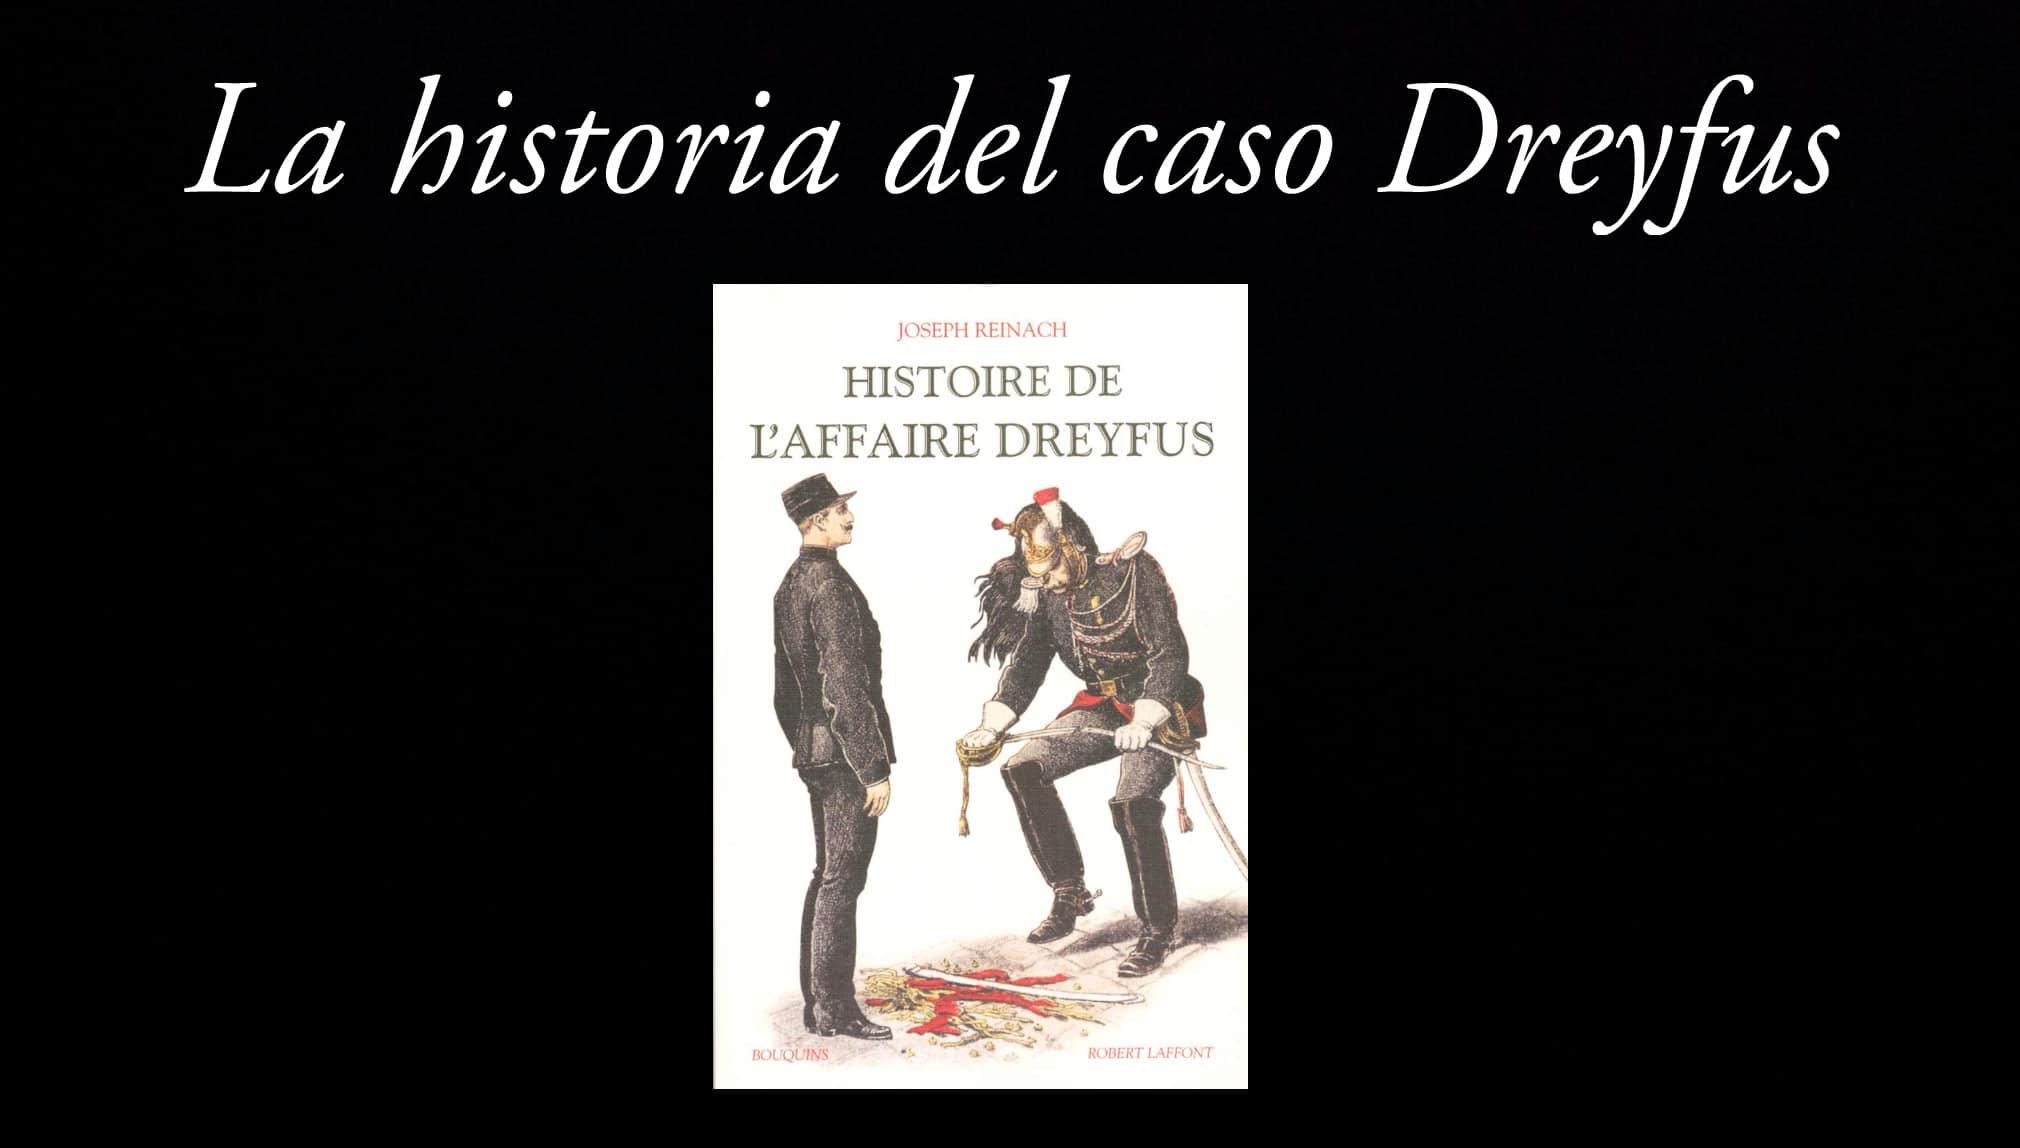 La historia del caso Dreyfus, de Joseph Reinach.